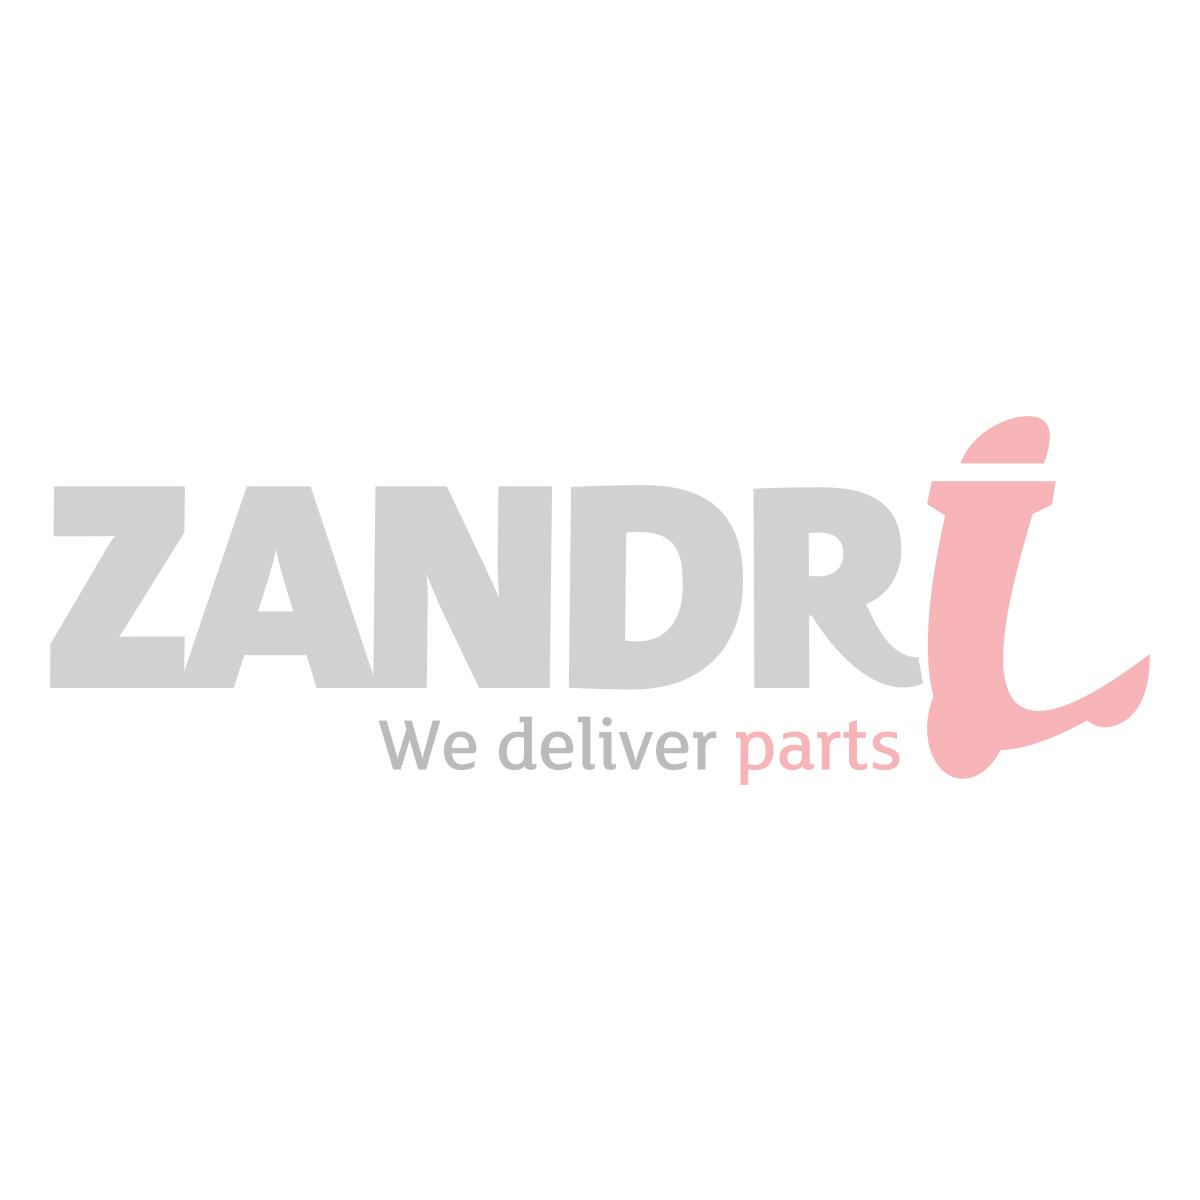 Uitlaat Jamarcol Vespa Sprint / Primavera / Piaggio Zip (ovaal model Akrapovic) IGET euro4 vanaf 2018